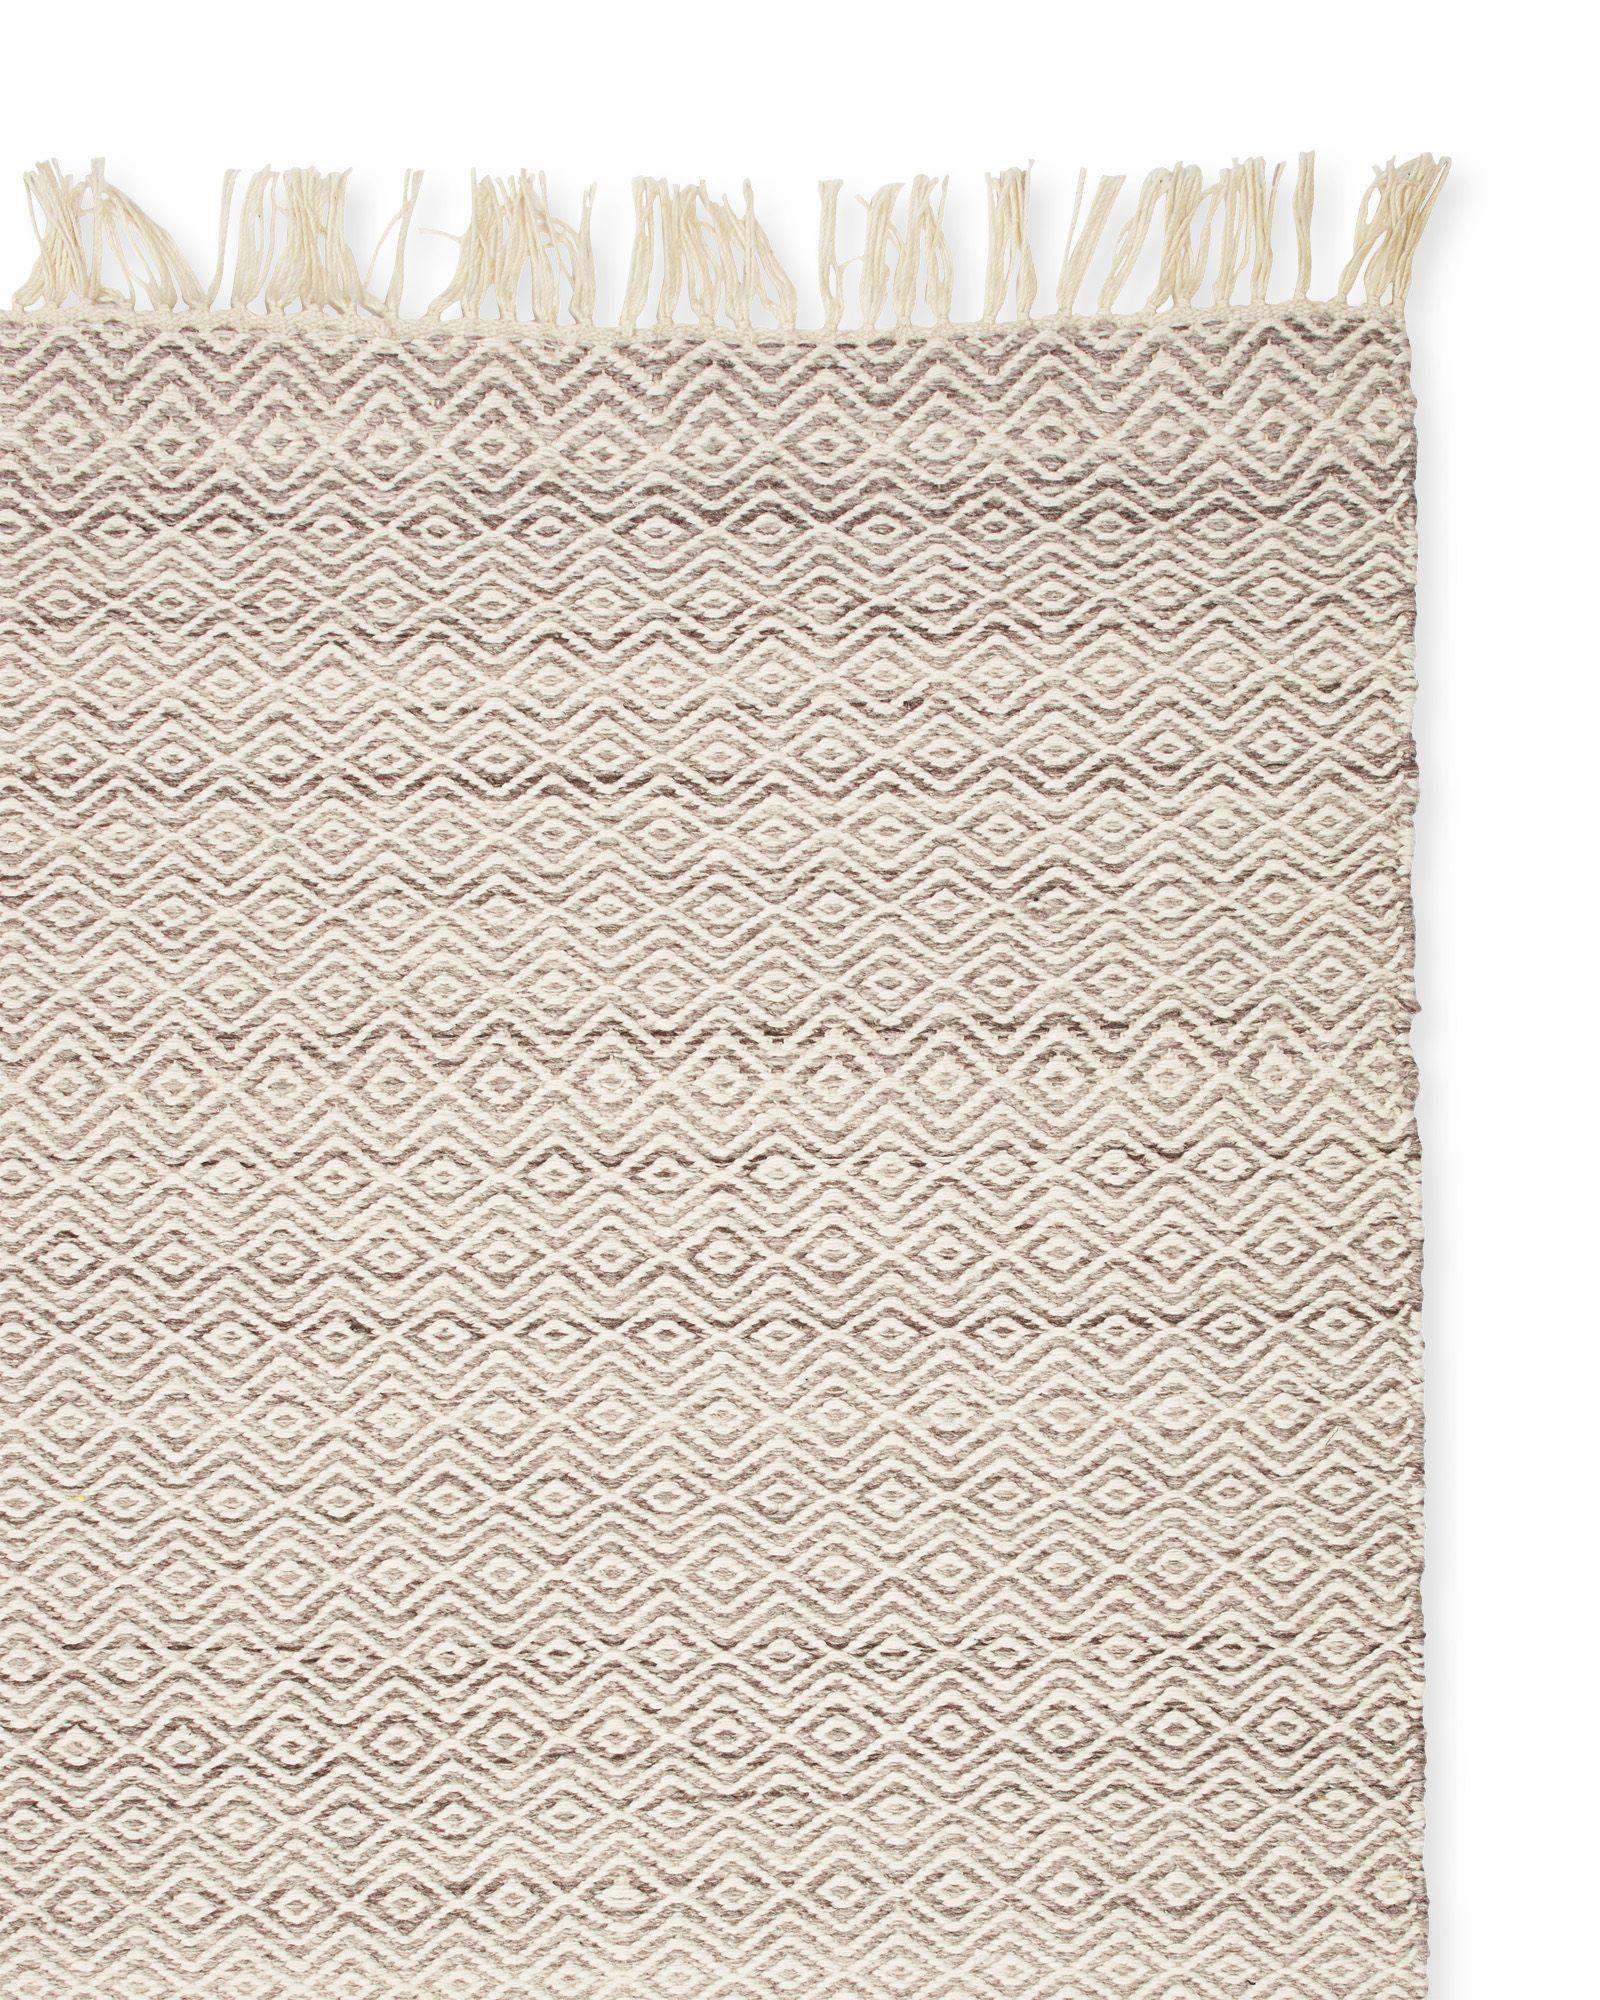 Outdoor Patio Carpet Squares: Seaview Outdoor Rug - Serena & Lily